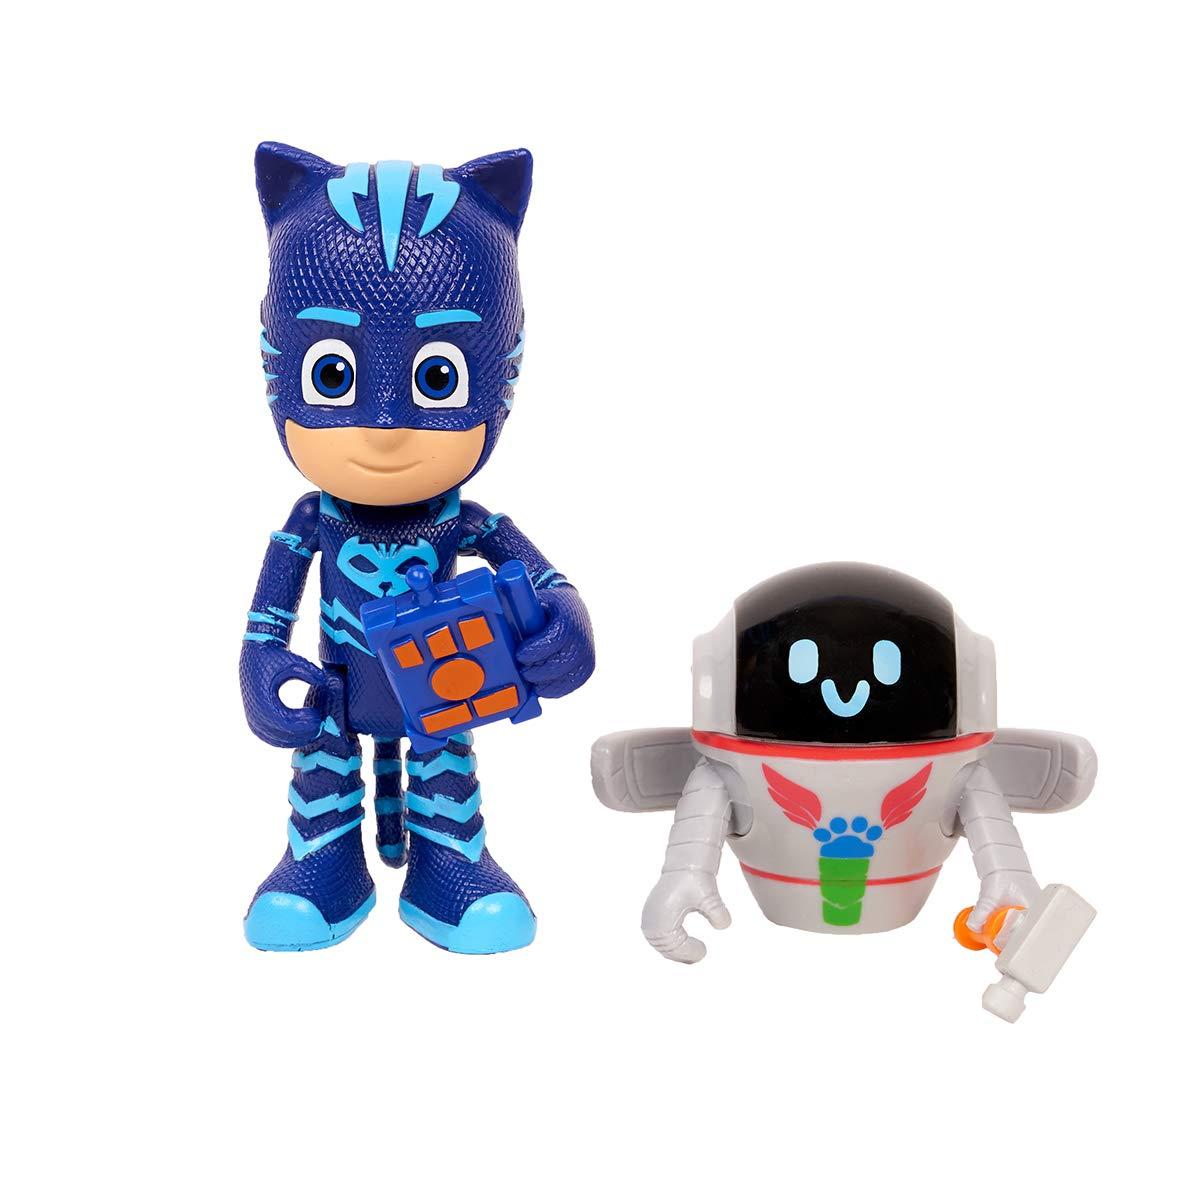 PJ Masks Figuren Set Catboy + PJ Robo : Amazon.es: Juguetes y ...